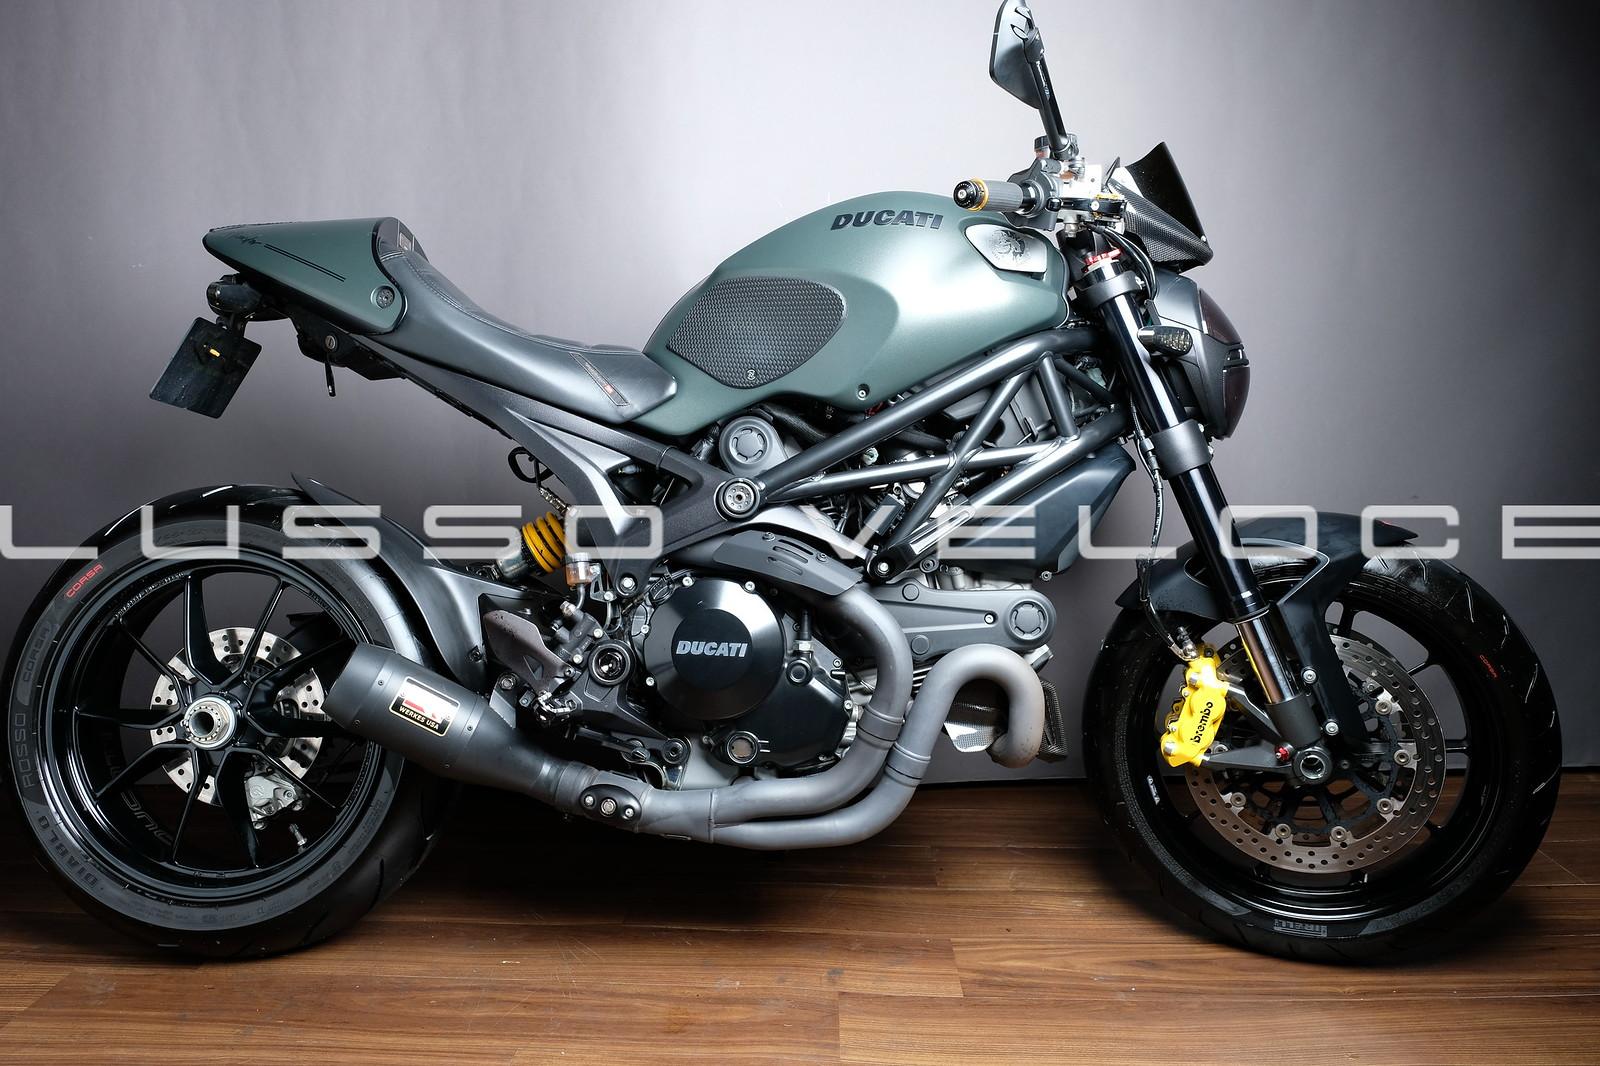 Ducati Monster 1100 Evo Diesel Special edition